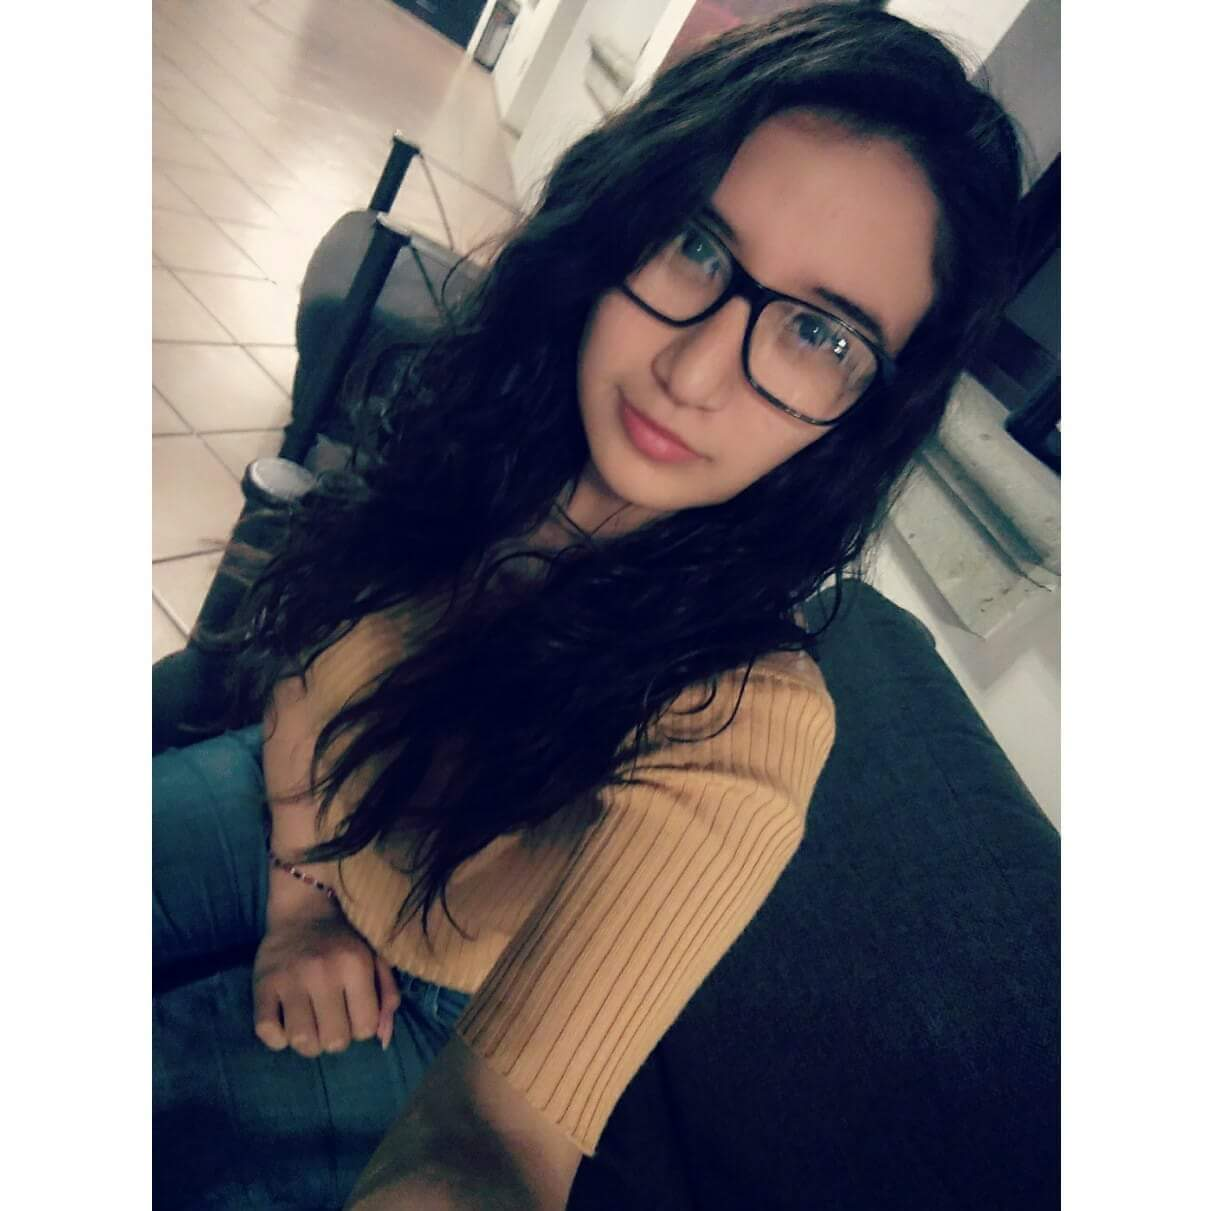 Estefania Mendoza hermosa jovencita tetona 2